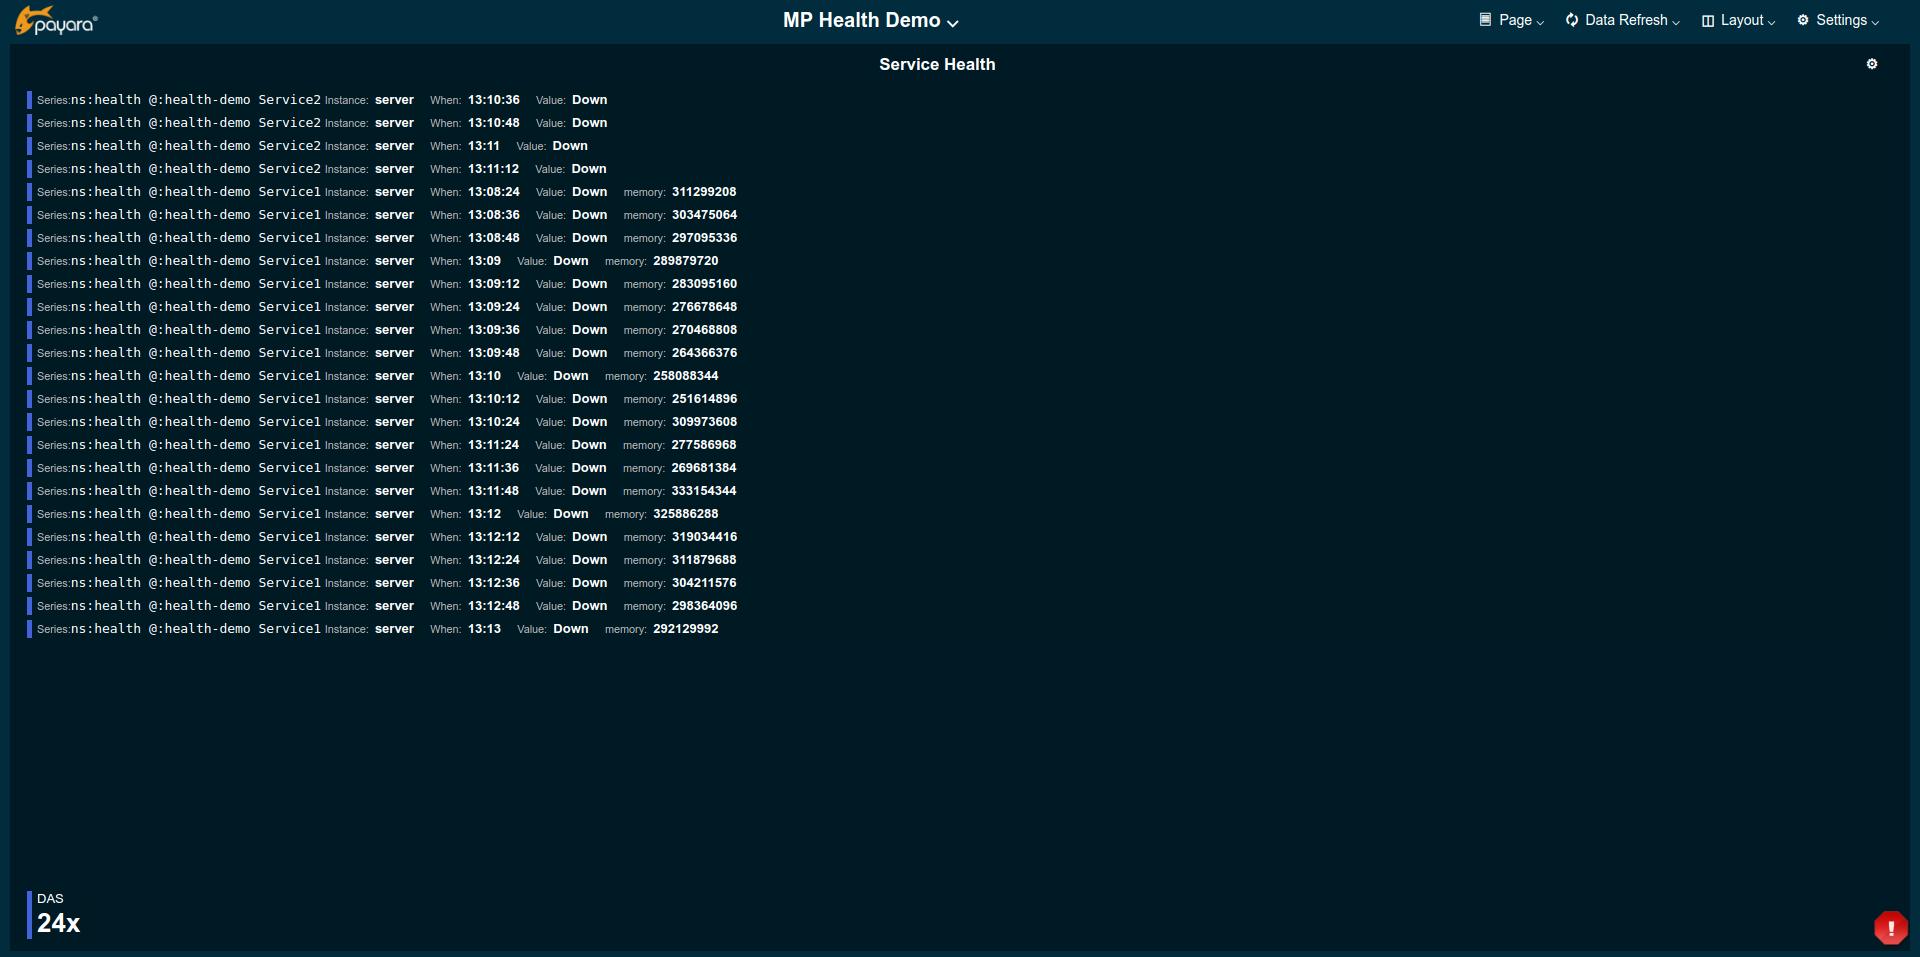 screenshot-x1_8080-2020.08.11-13_13_11